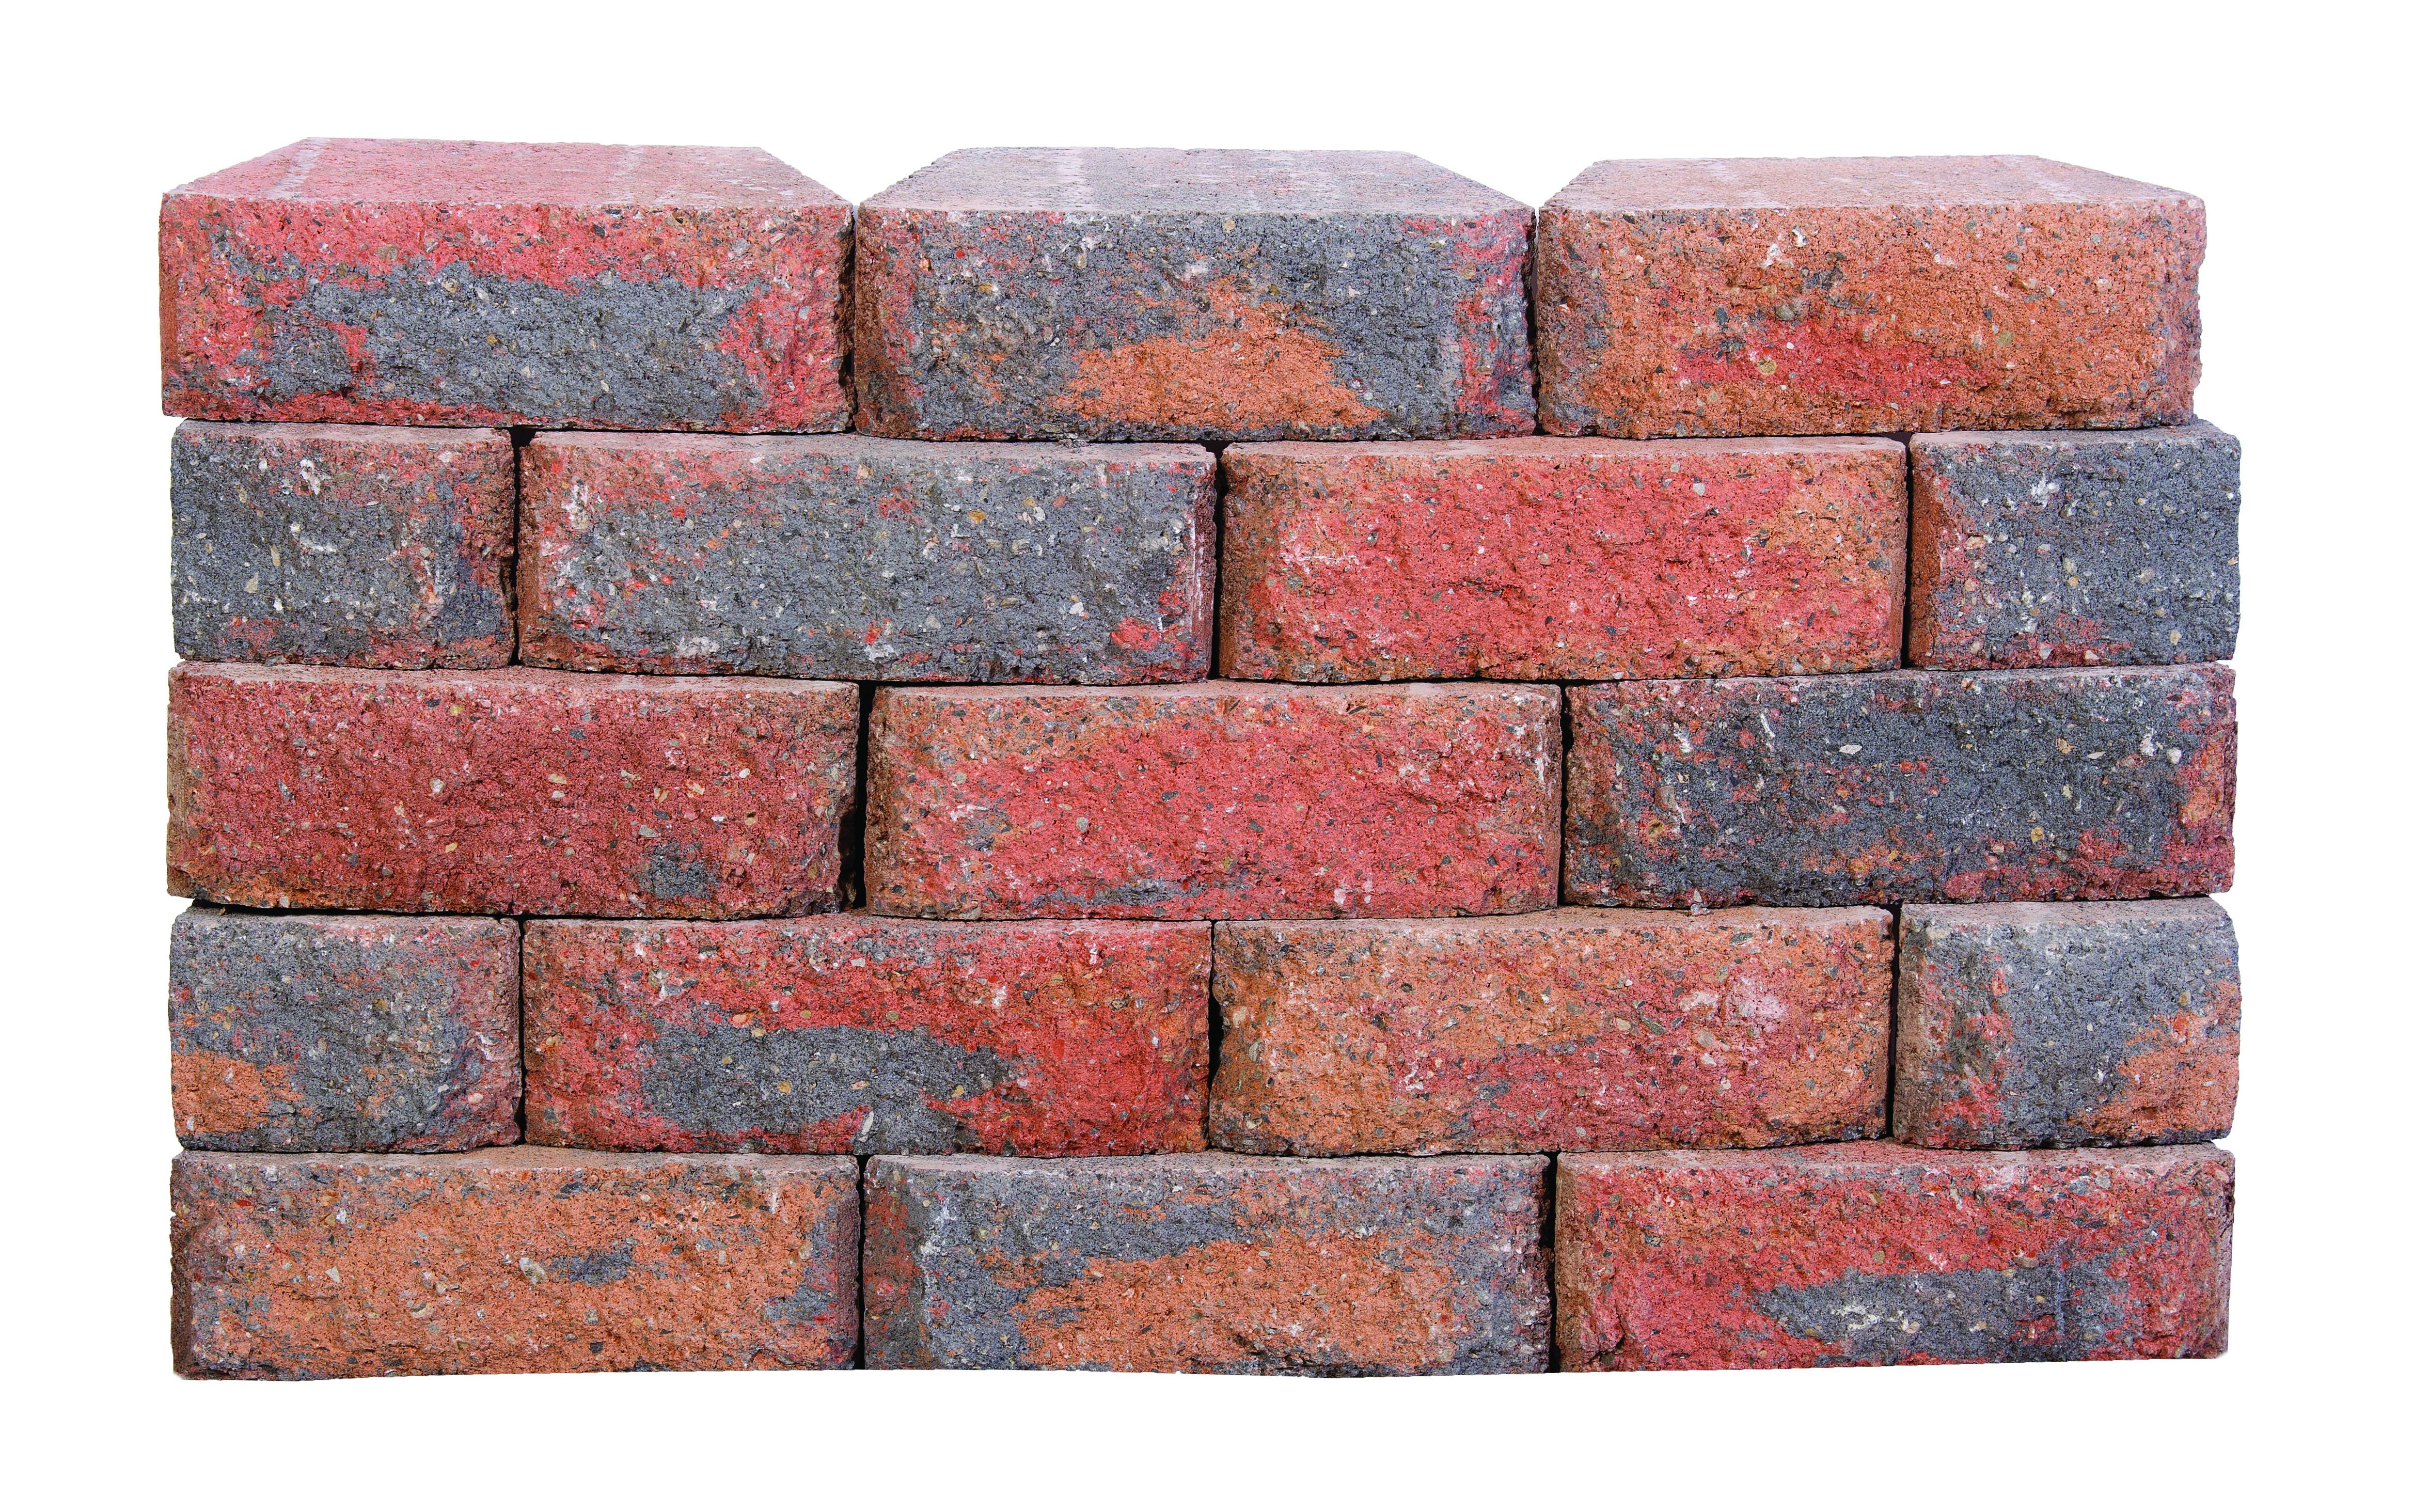 Wall Block Aspen Cashel L295xD180xH100mm (Each)